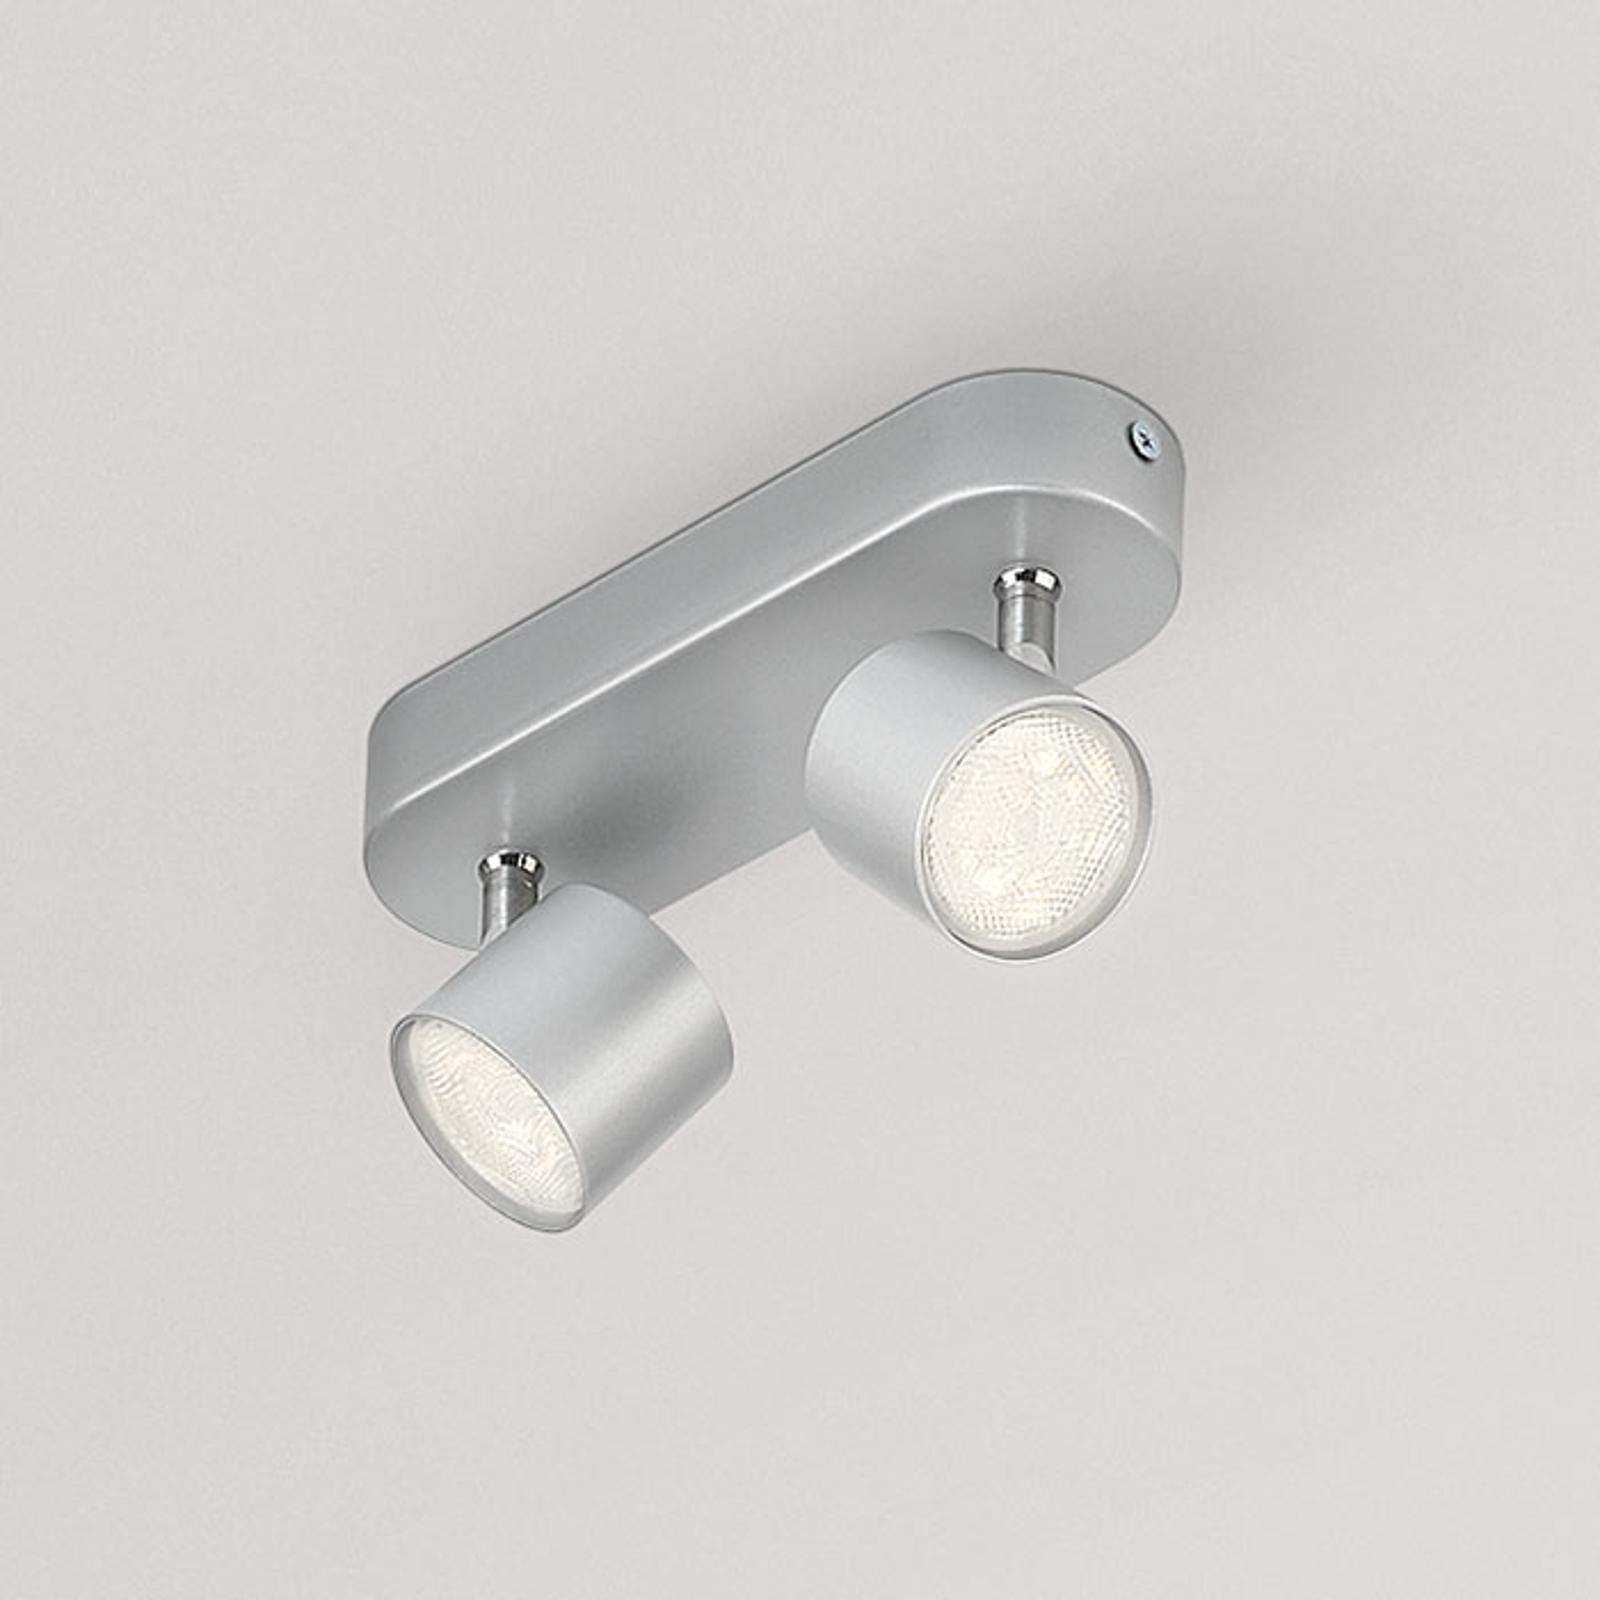 Lampa sufitowa LED STAR, 2-pkt., odchylana